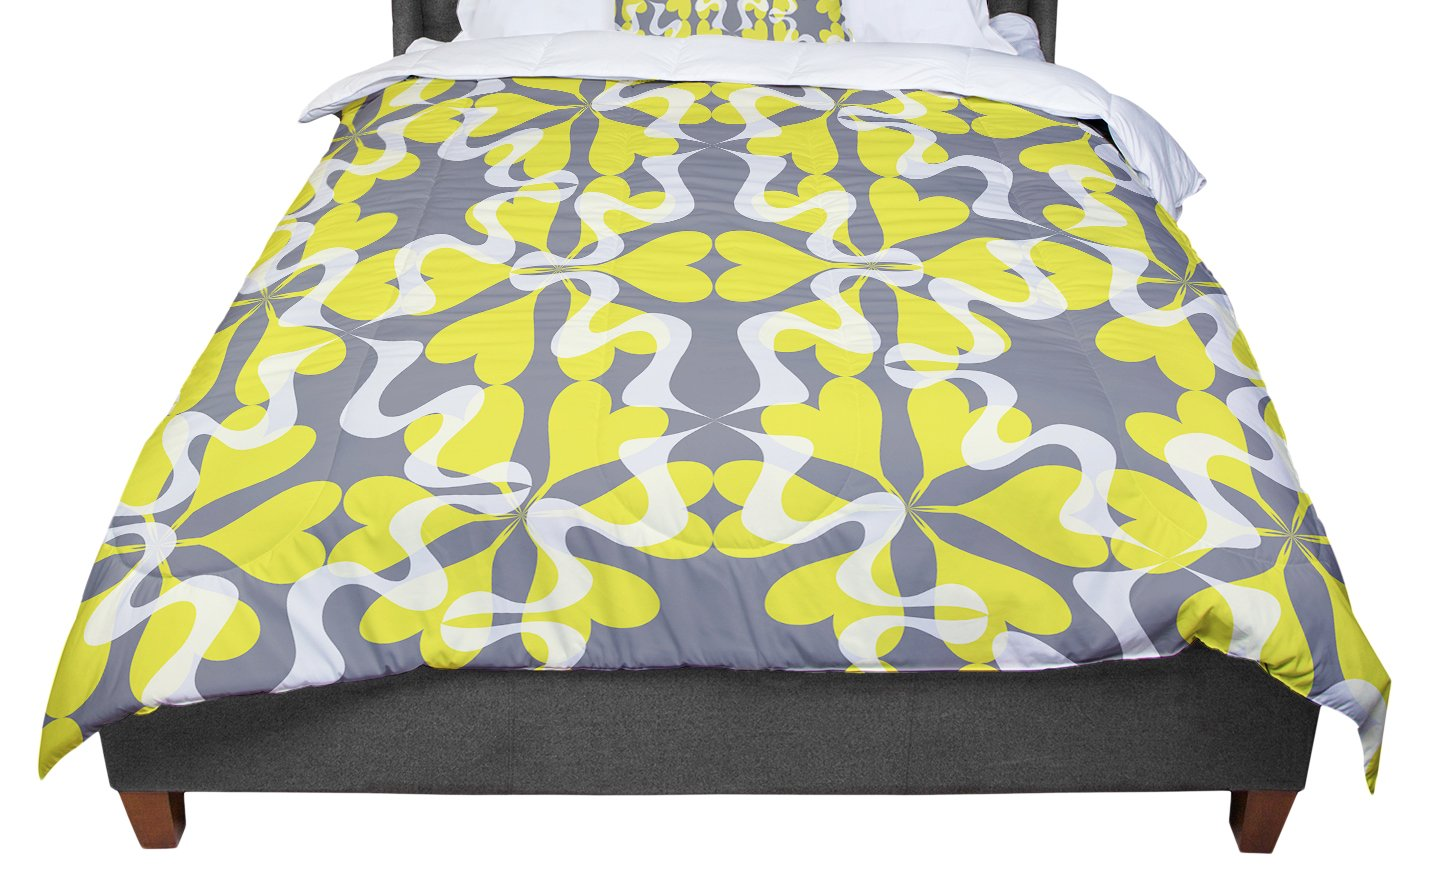 KESS InHouse Miranda Mol Flowering Hearts King Cal King Comforter 104 X 88